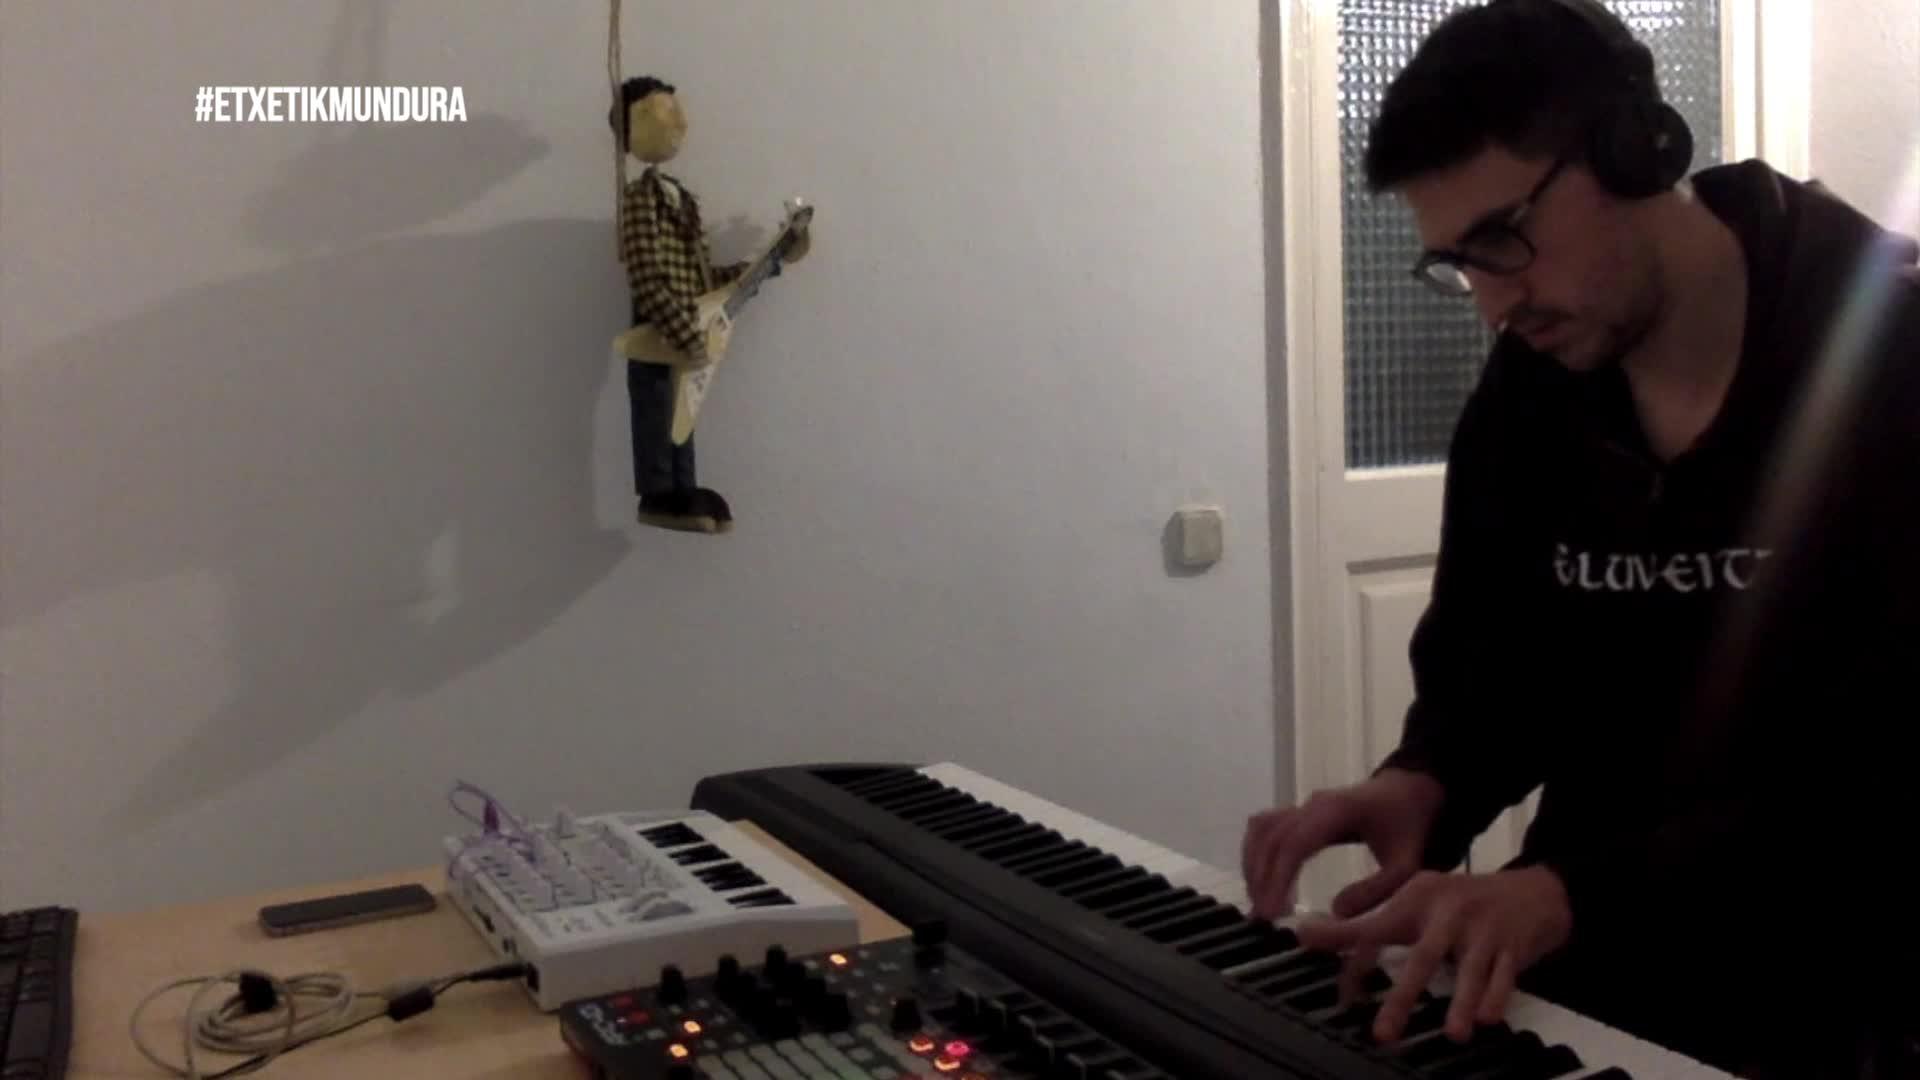 Mikel Iraeta musikaria, etxetik mundura